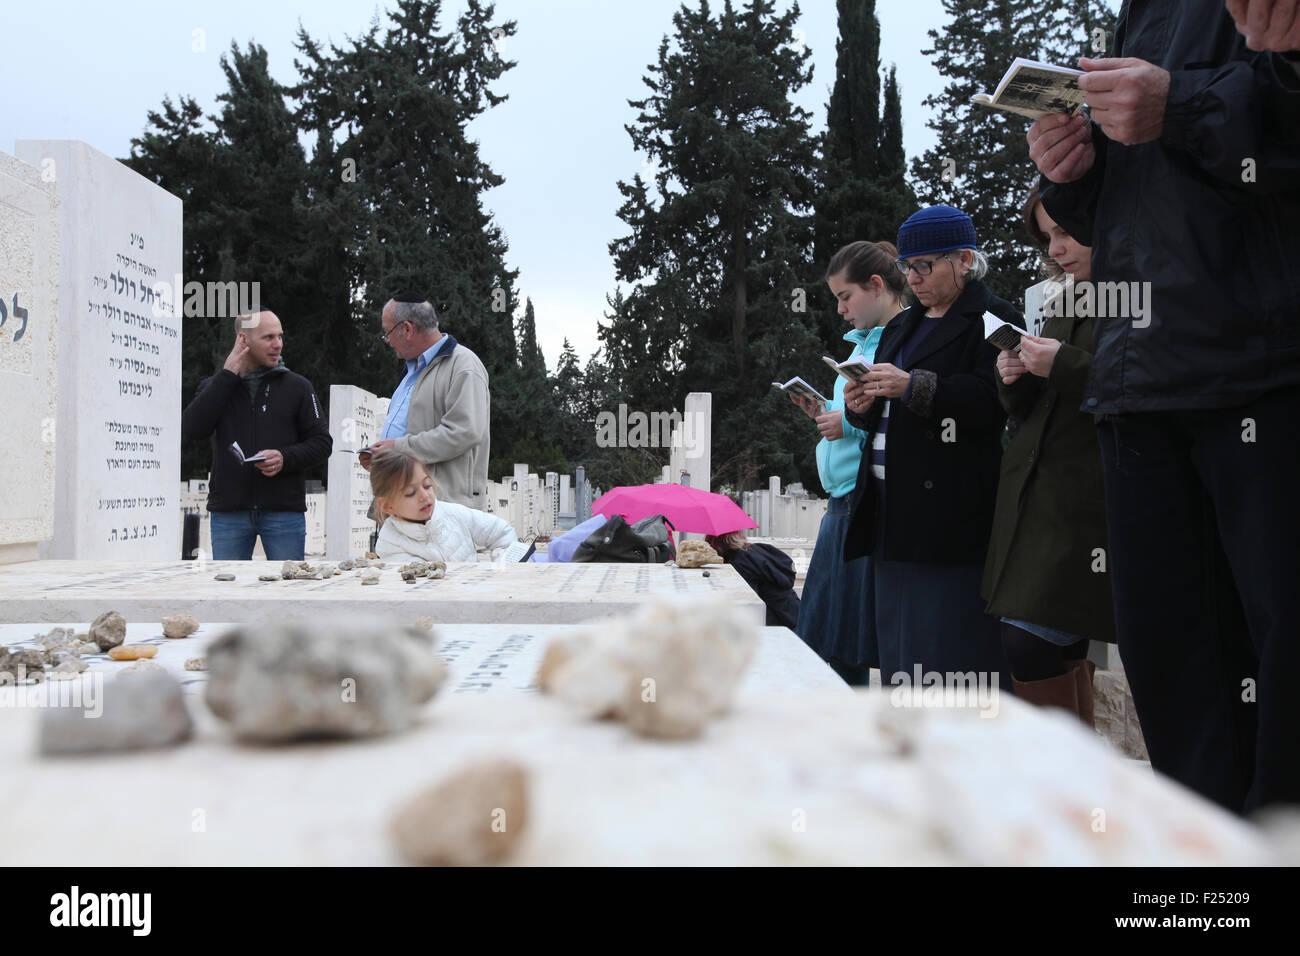 family members and friends of the deceased at the anual Azcara (bereavement) in Kiryat shaul cemetery in Tel Aviv - Stock Image